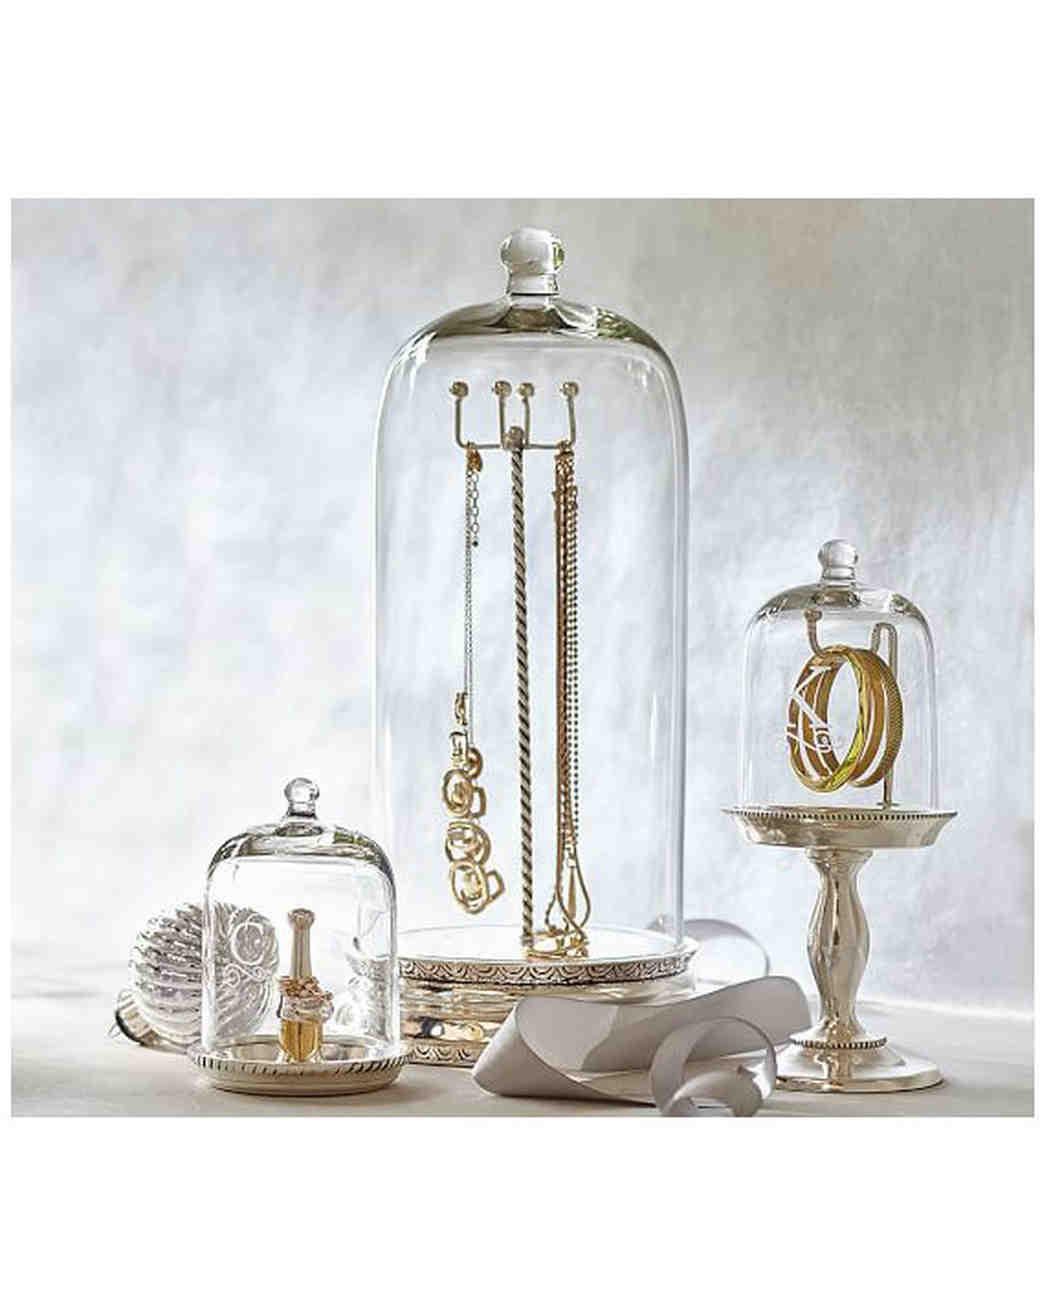 hollowware anniversary gifts glass cloche jewelry storage pottery barn